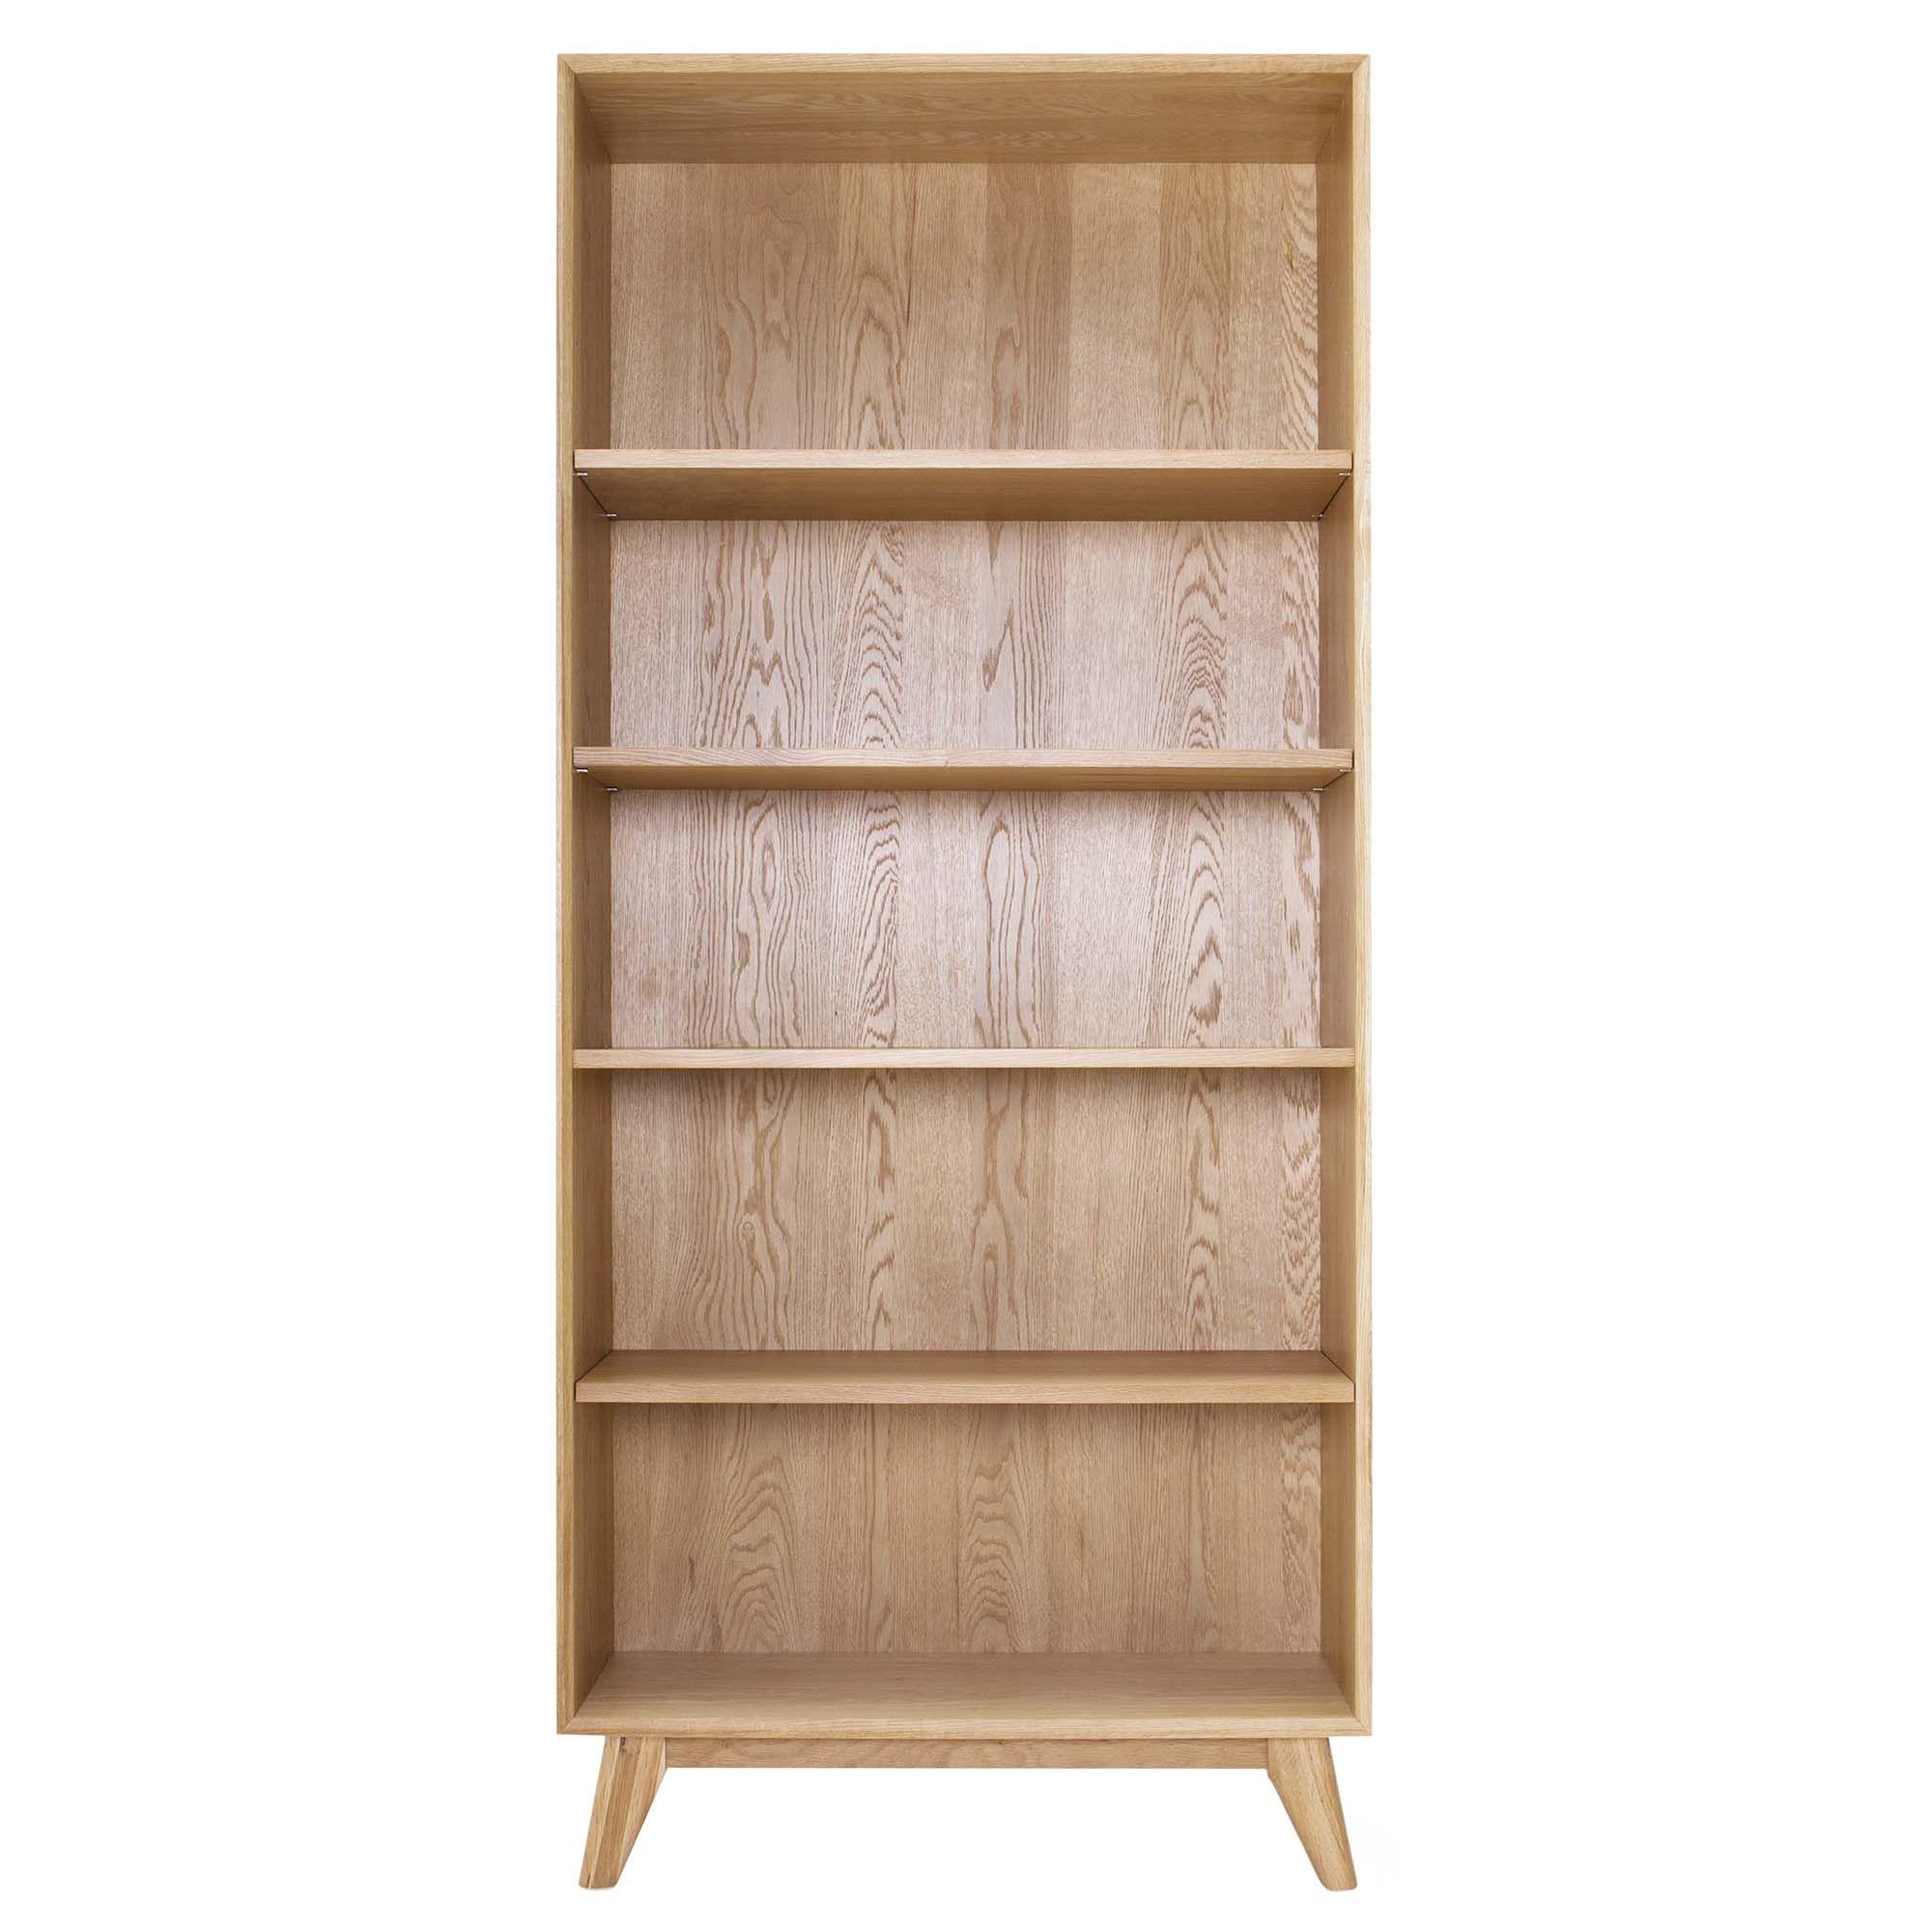 Best Lund Oak Tall Bookcase Oak Tables Dining Room 400 x 300